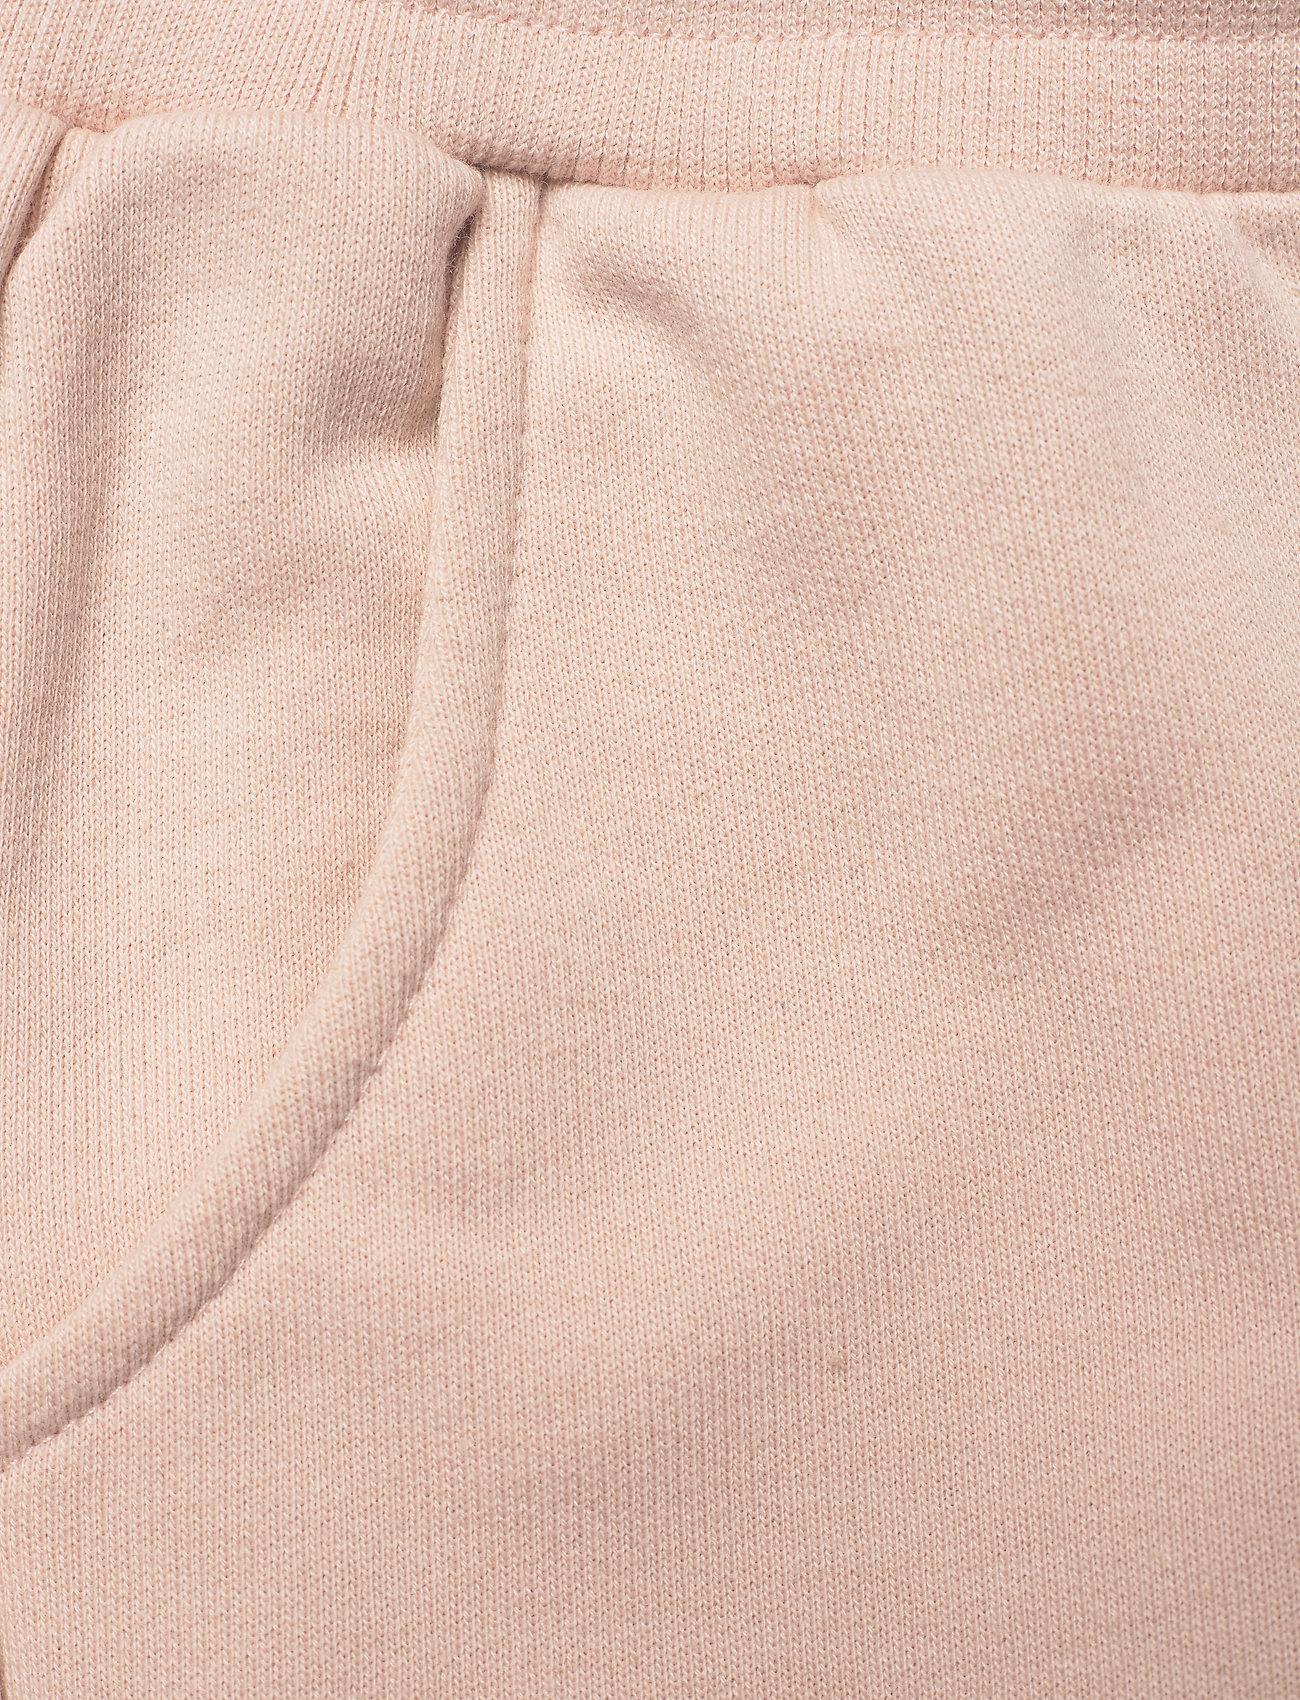 Mini A Ture - Even pants, K - sweatpants - rose dust - 2